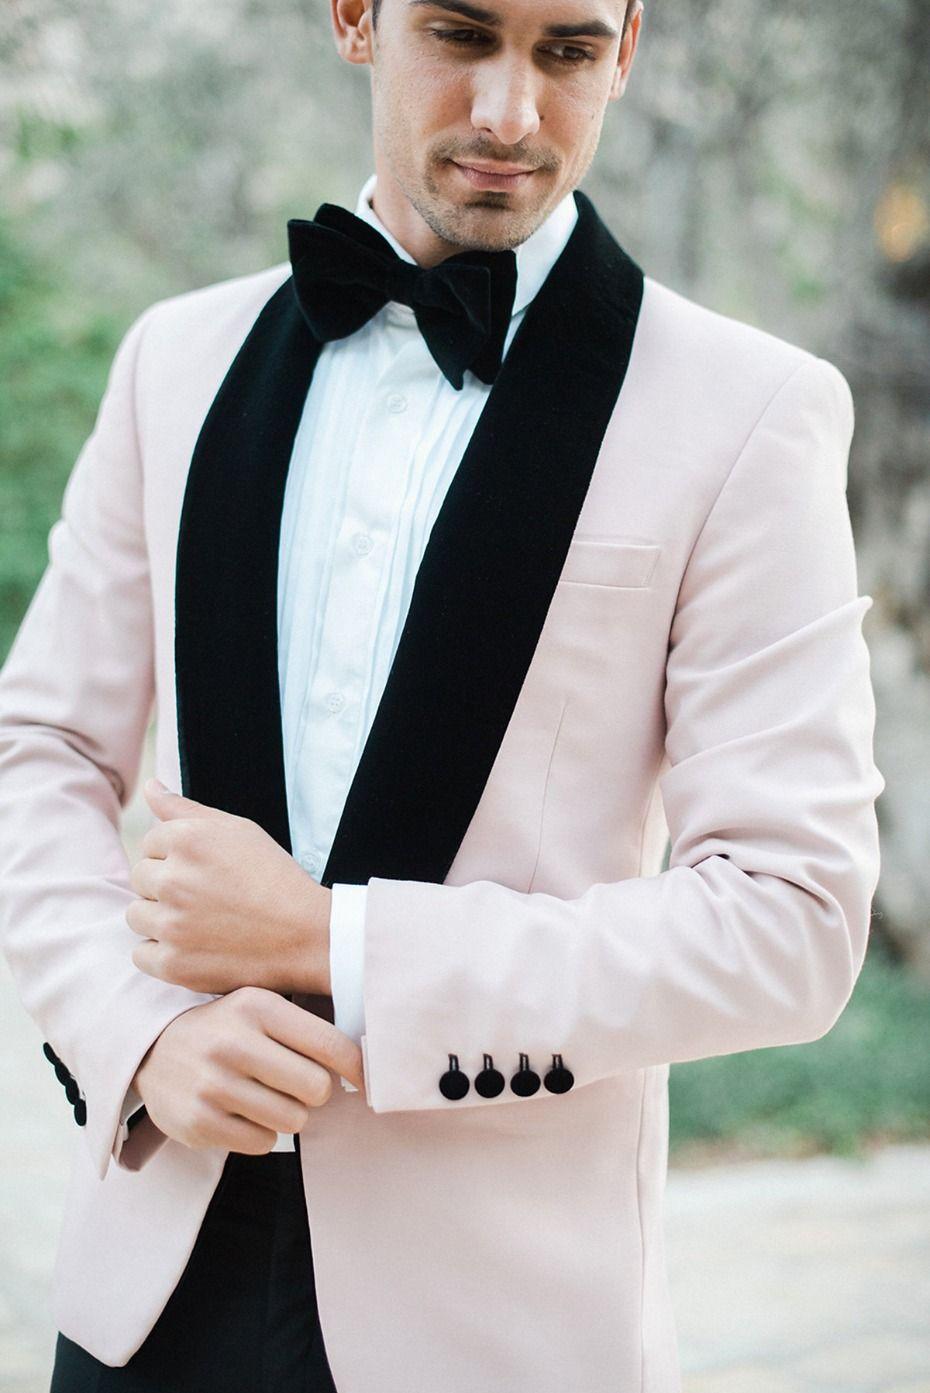 Men's tuxedo shirt suit